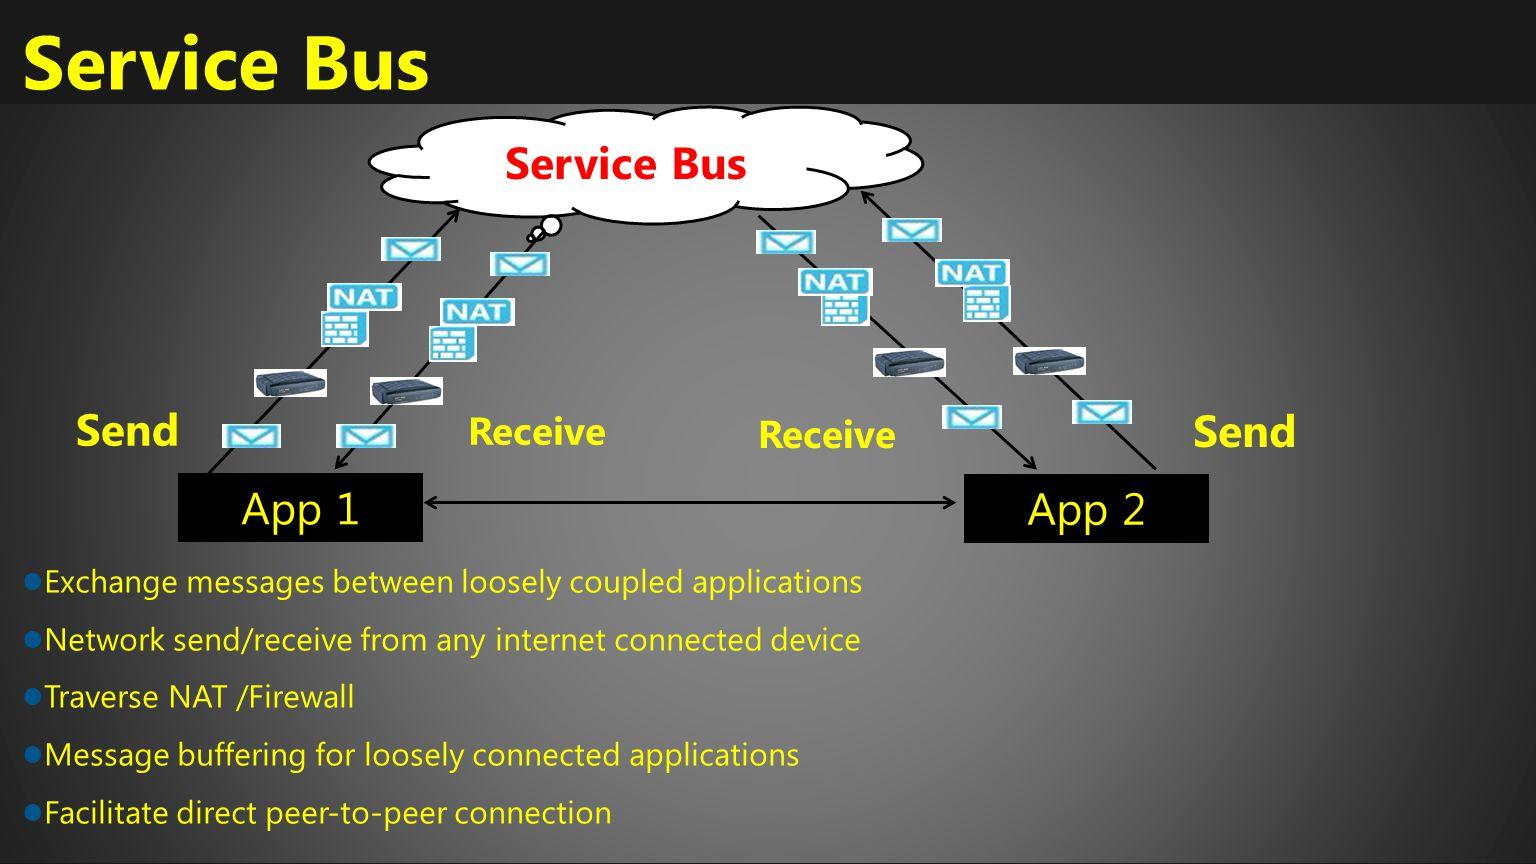 Service Bus Service Bus Send Send App 1 App 2 Receive Receive